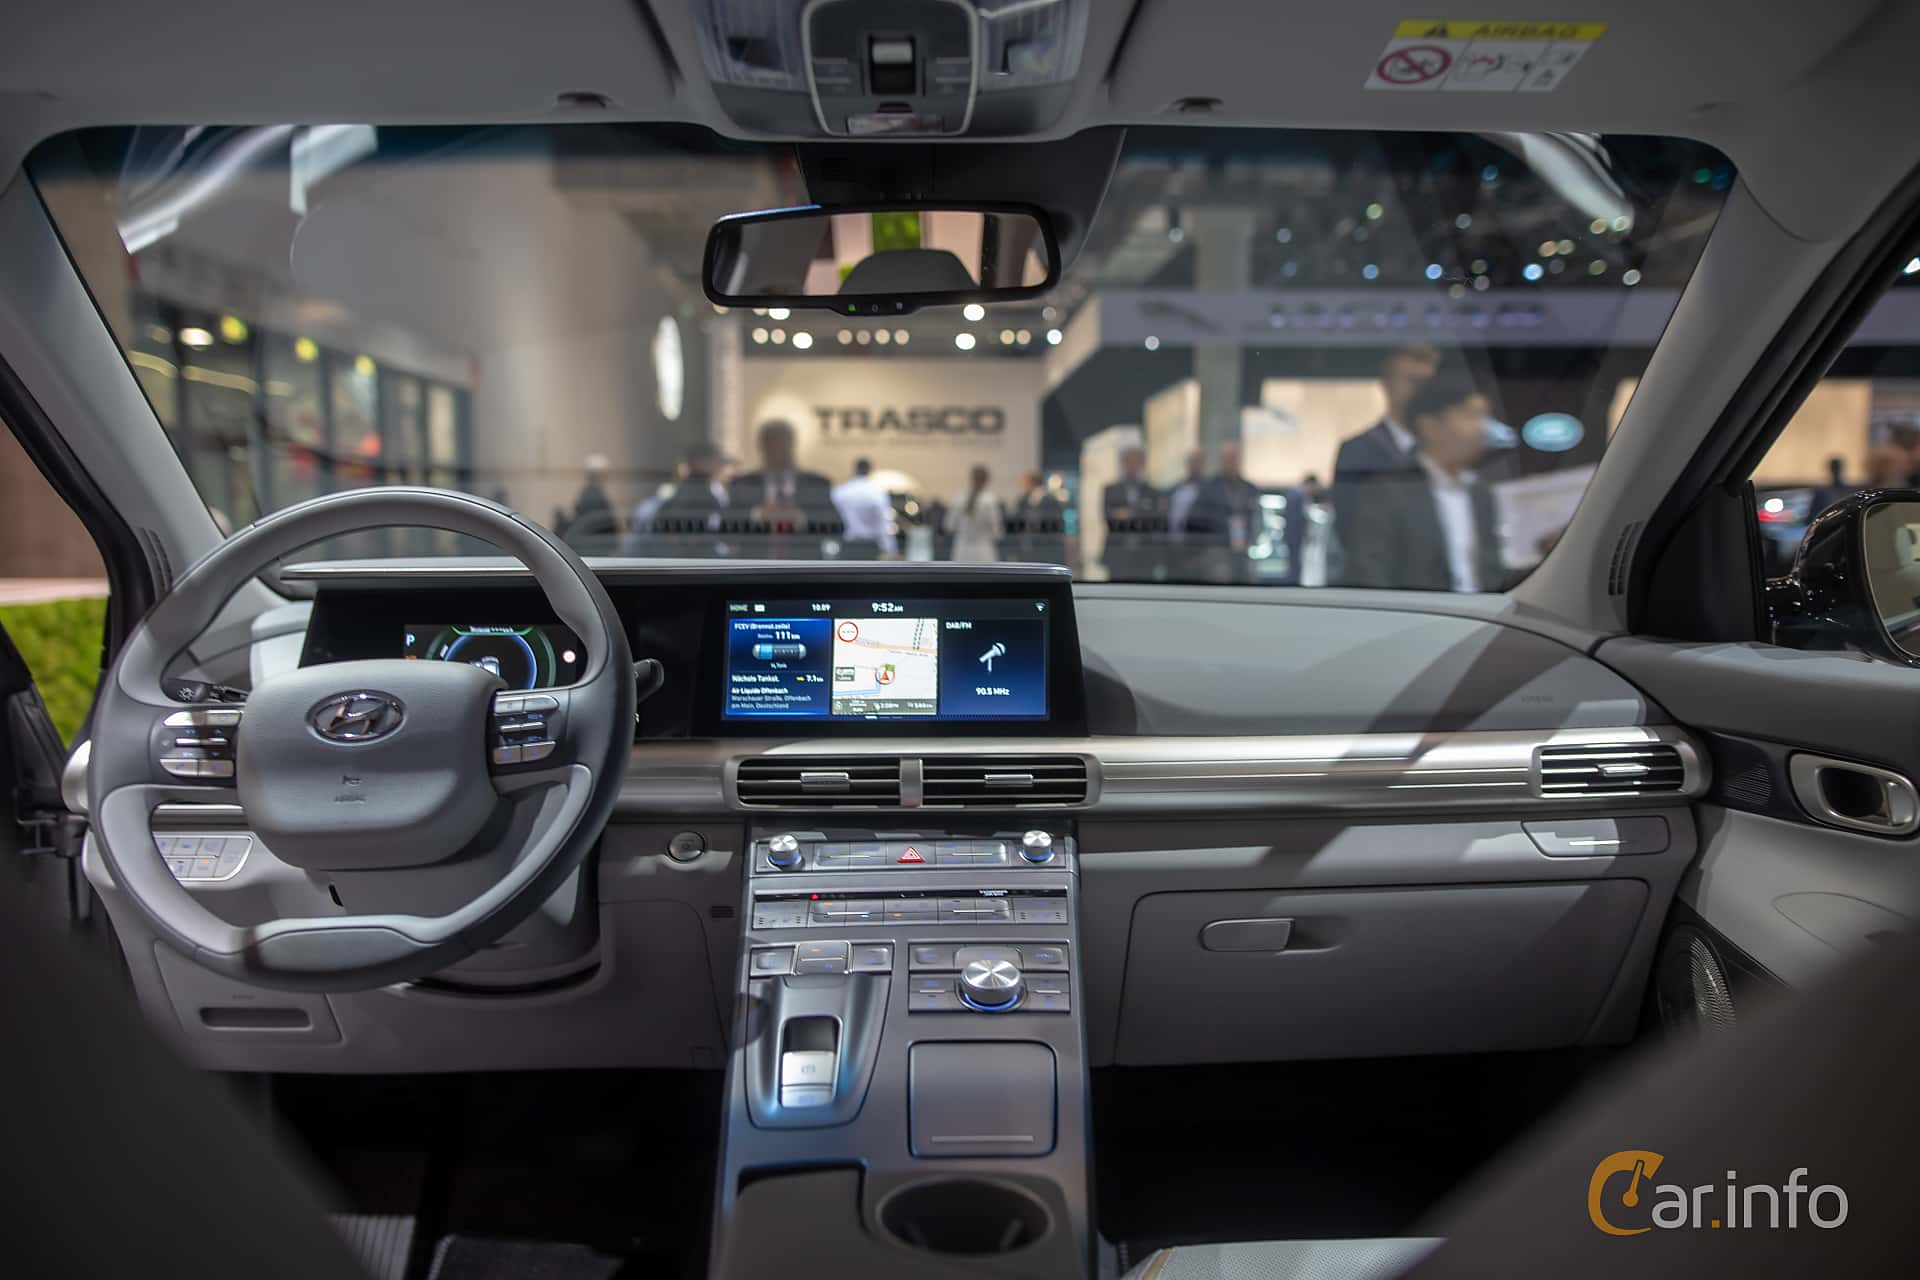 Hyundai Nexo FuelCell Single Speed, 163hk, 2020 at IAA 2019